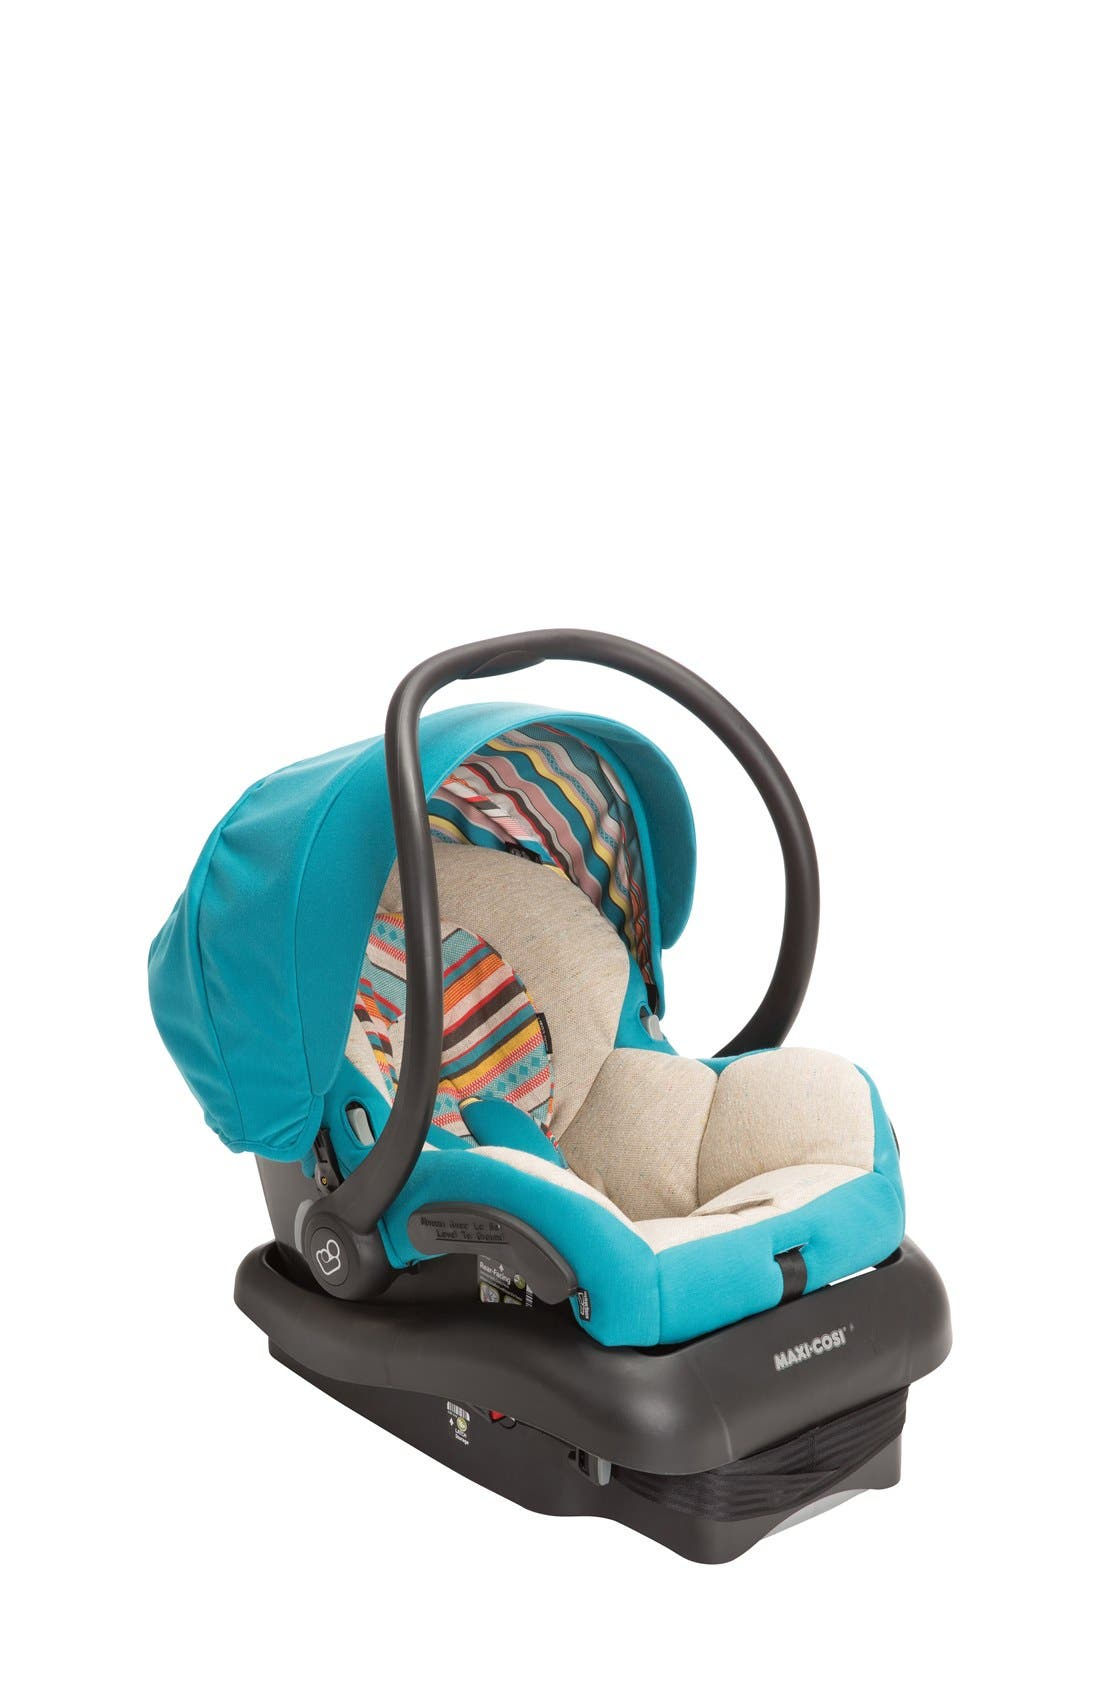 Alternate Image 1 Selected - Maxi-Cosi® 'Mico AP' Infant Car Seat